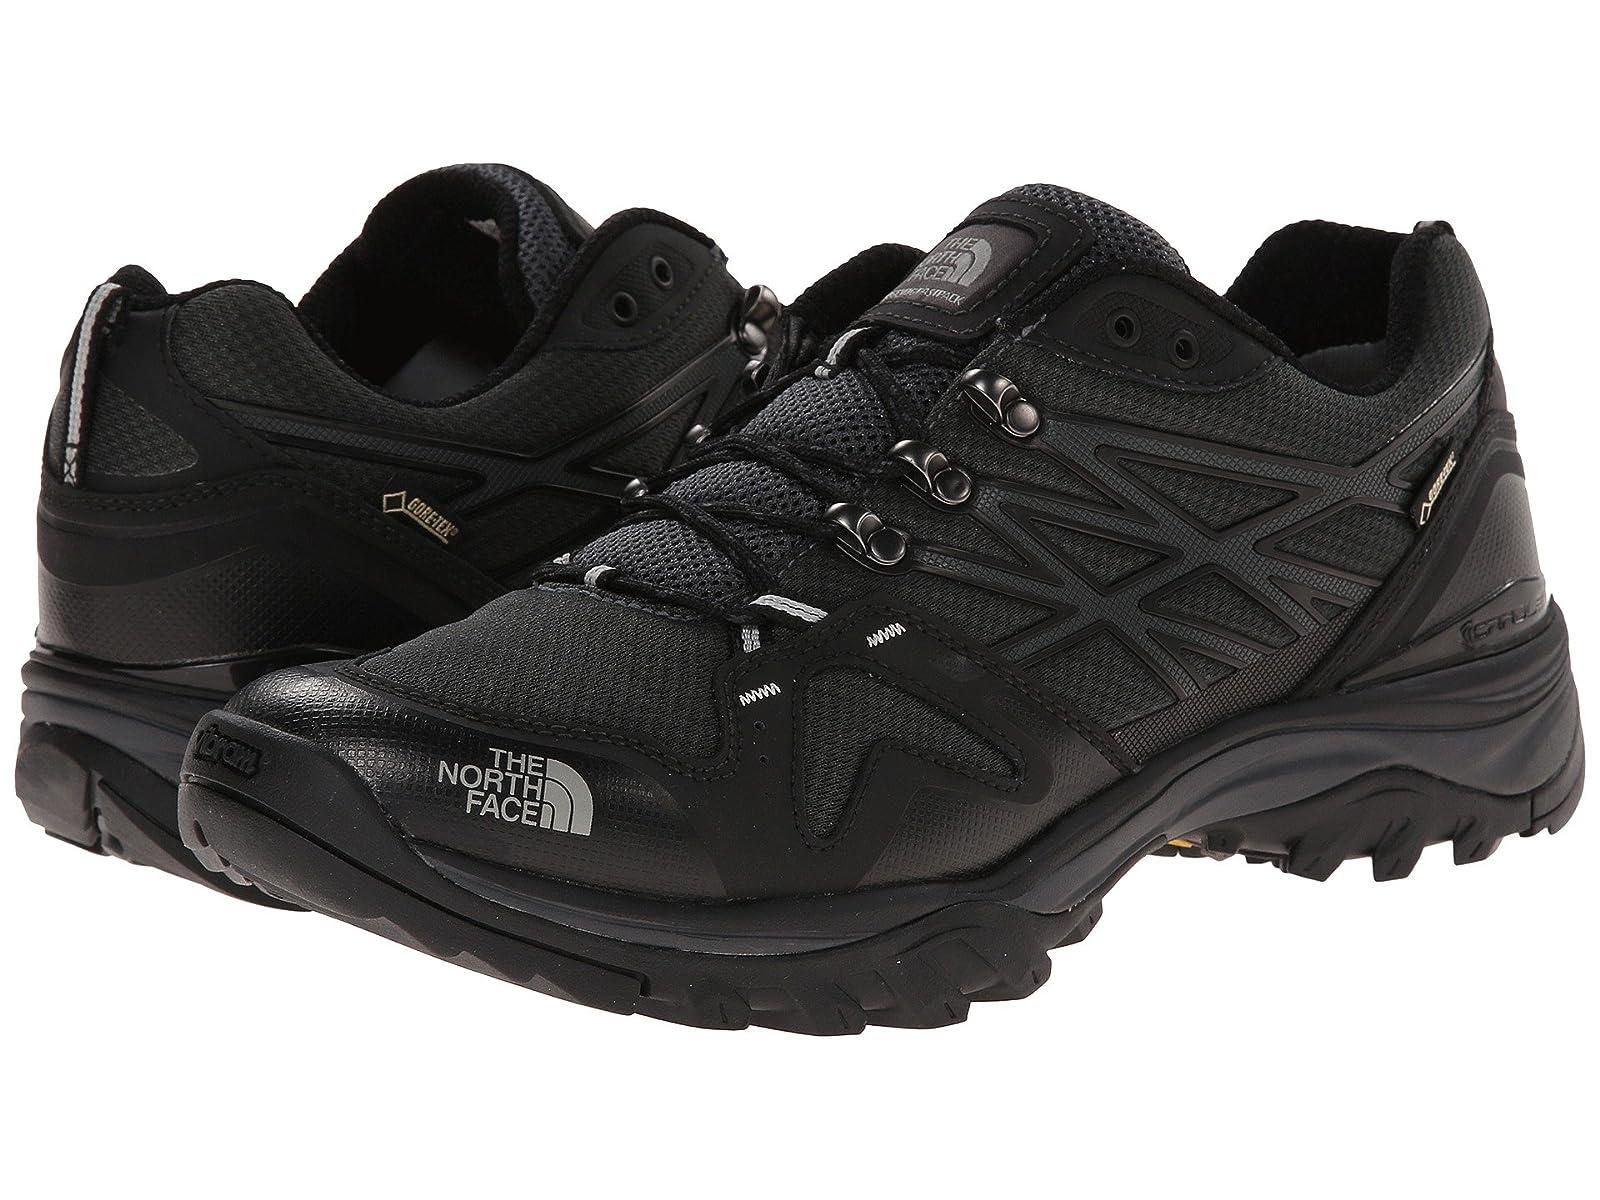 The North Face Hedgehog Fastpack GTX®Atmospheric grades have affordable shoes